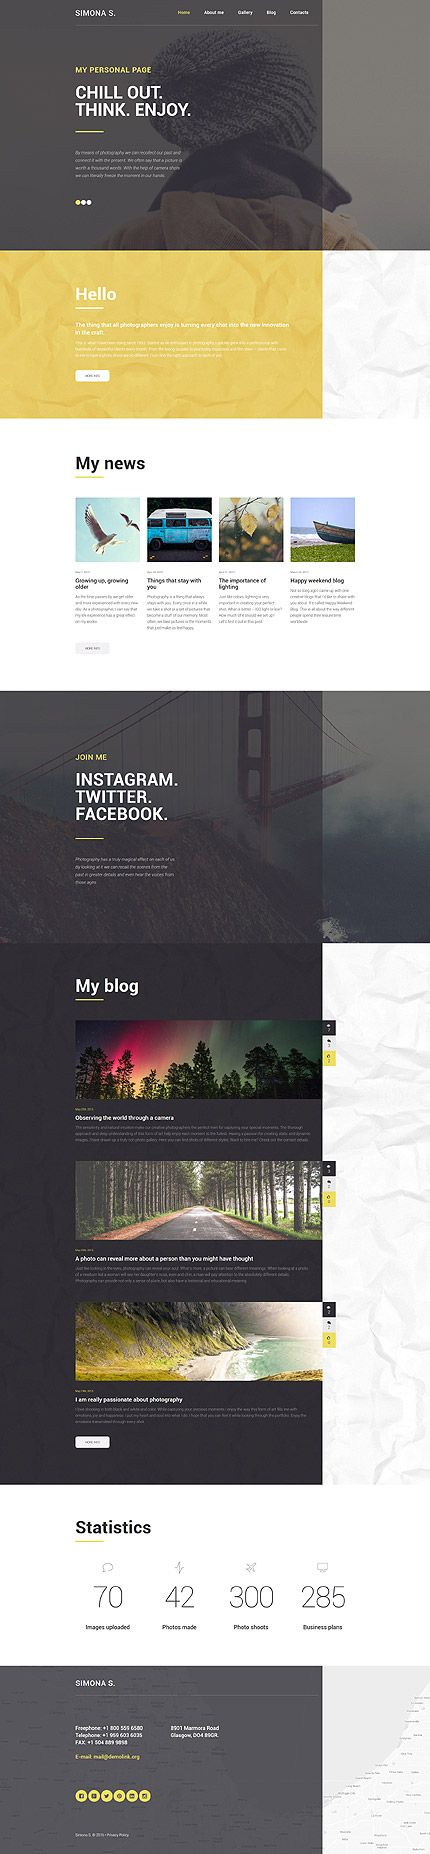 Template 58775 - Simona S  Responsive WordPress  Theme